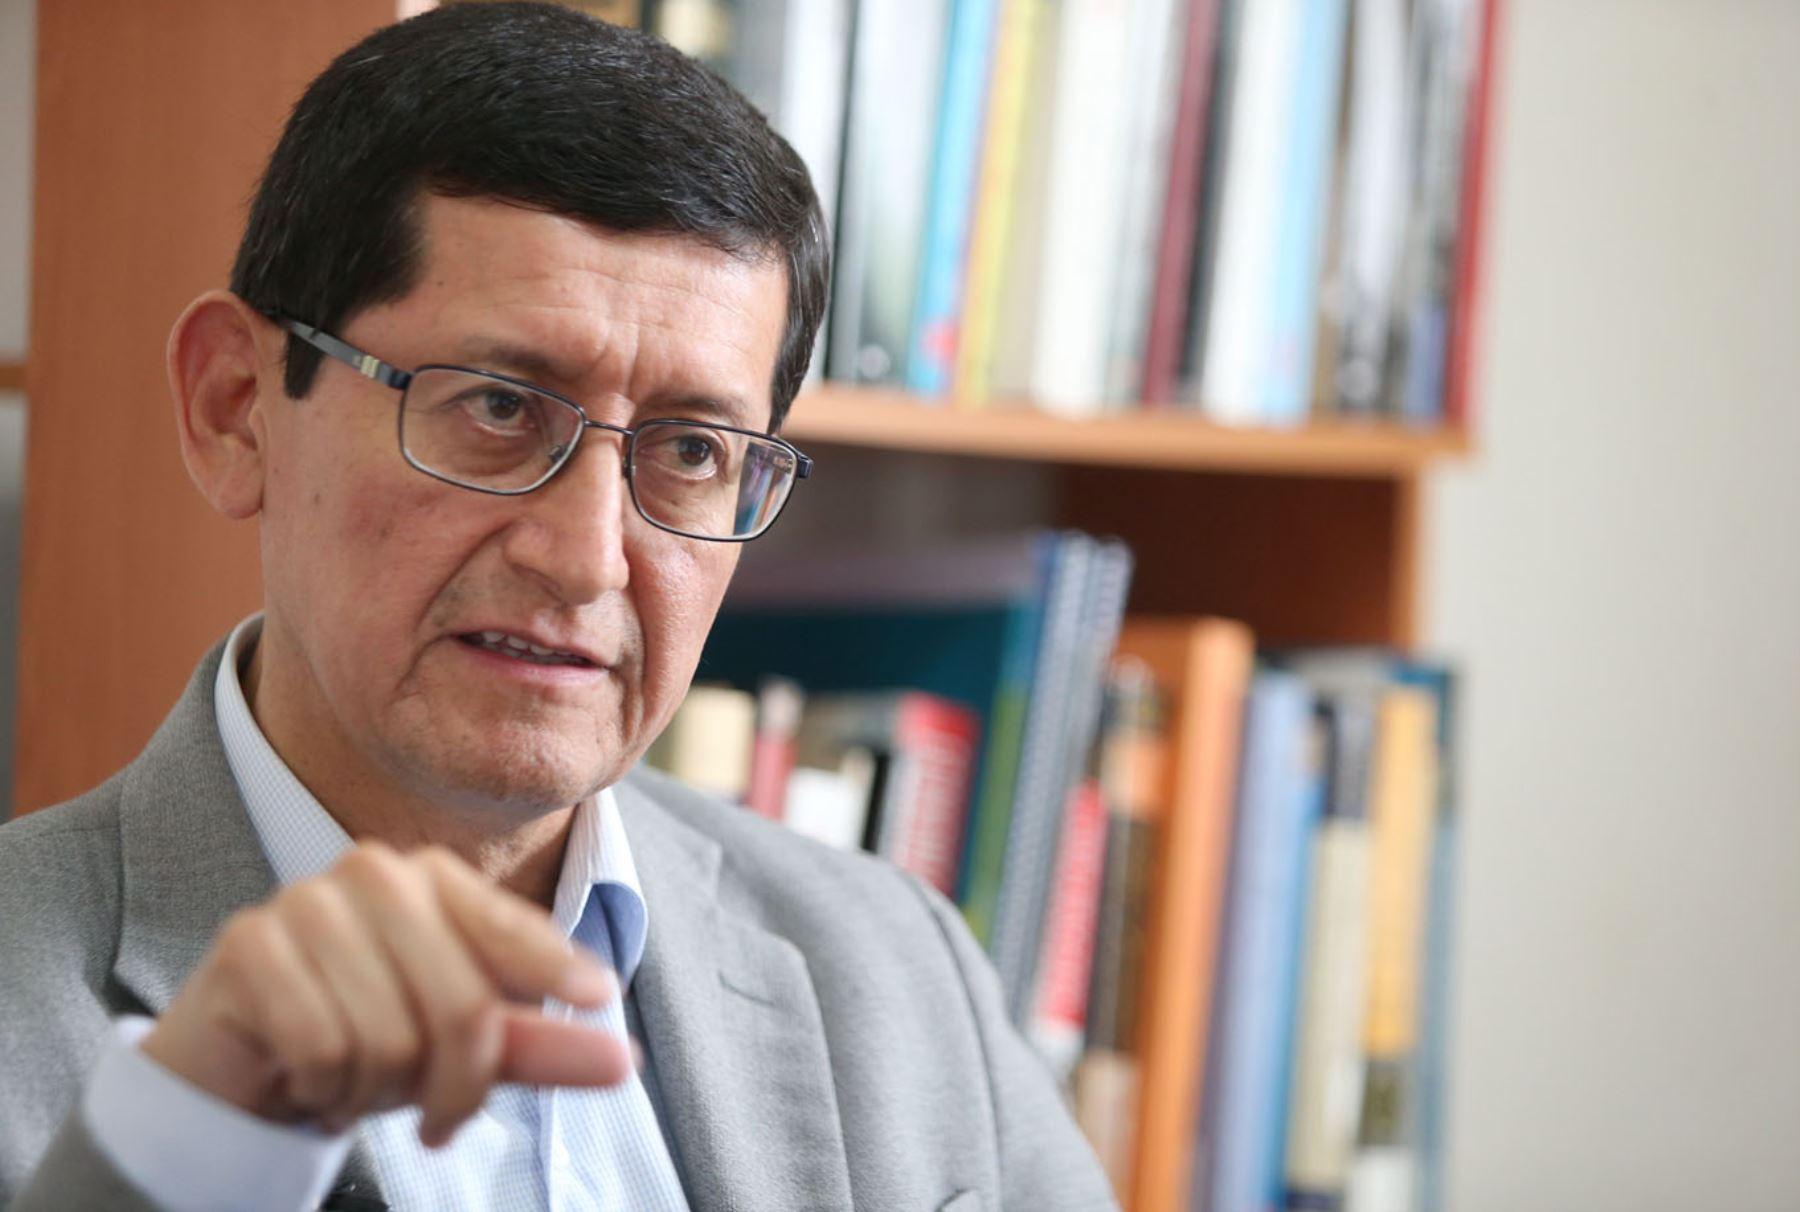 Economista Marco Aquino Rodríguez. ANDINA/Melina Mejía